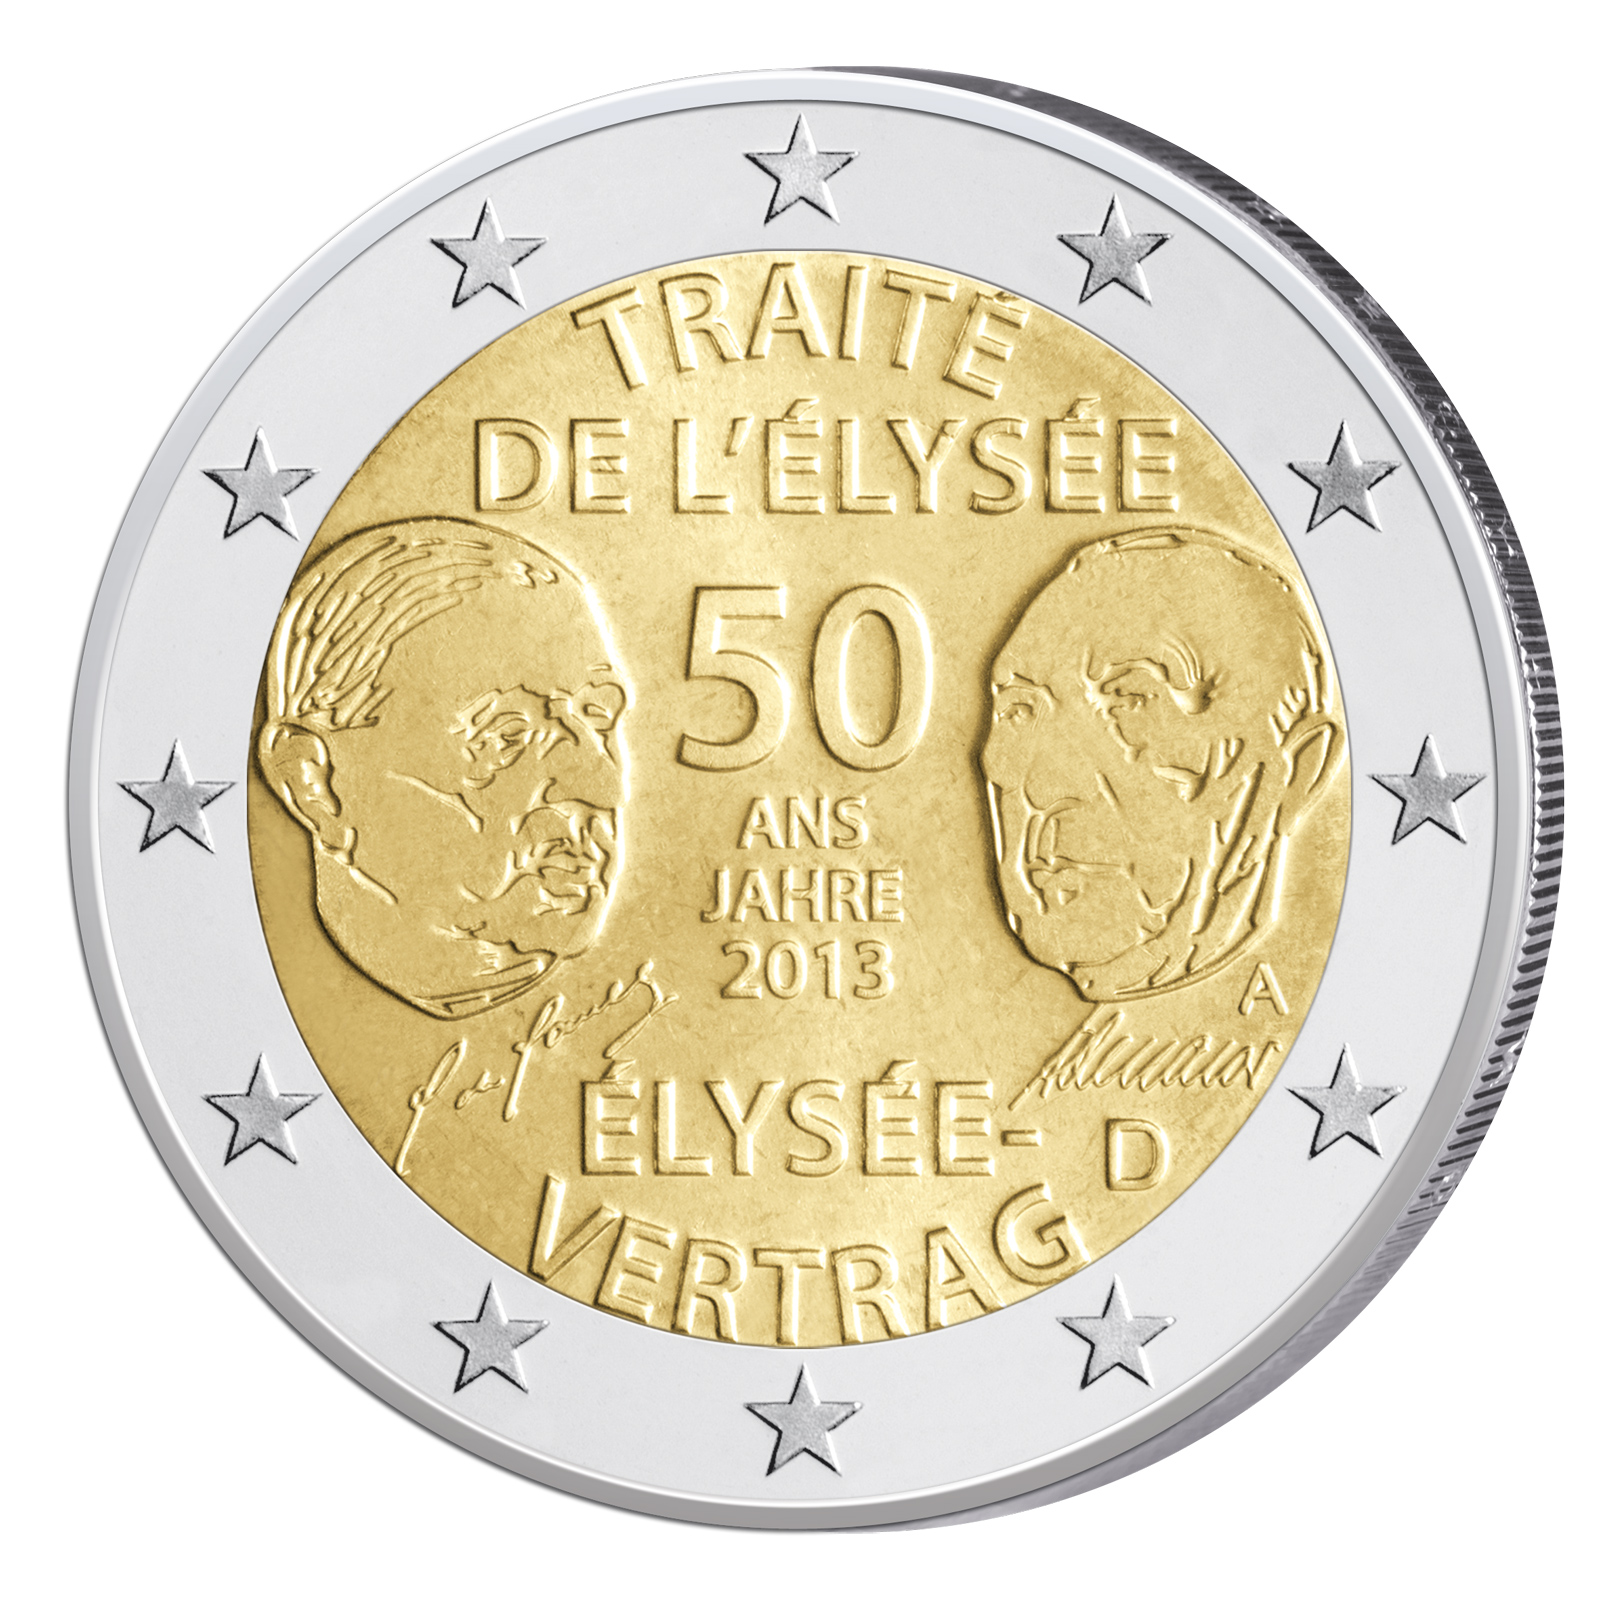 11 Oktober 1963 Konrad Adenauers Rücktritt Primus Münzen Blog